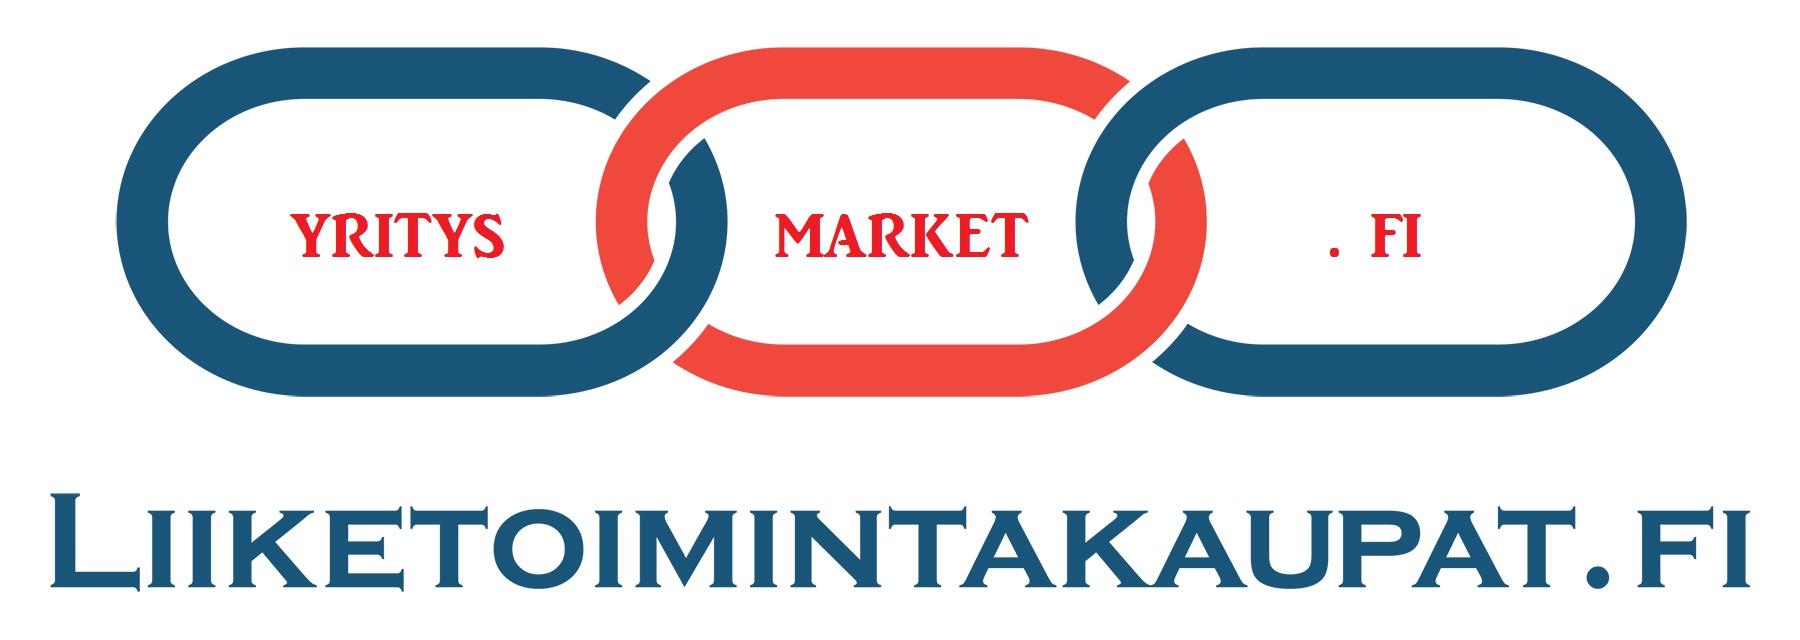 Logo 3 liiketoimintakaupat-2_JPEG Yritysmarketfijpg